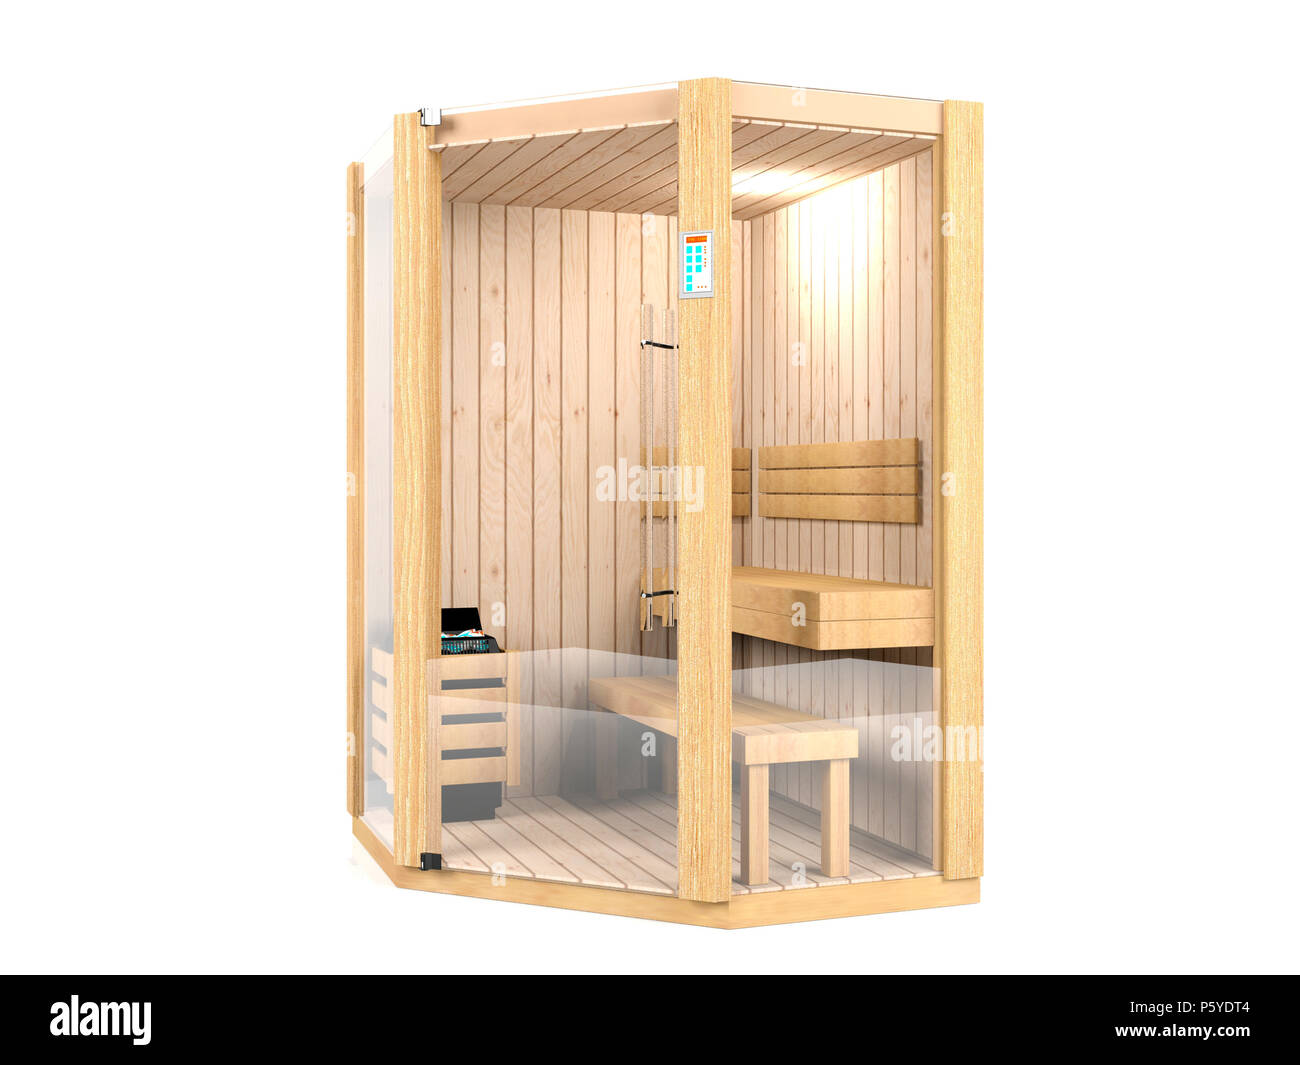 Cabine De Sauna Prix sauna room photos & sauna room images - alamy